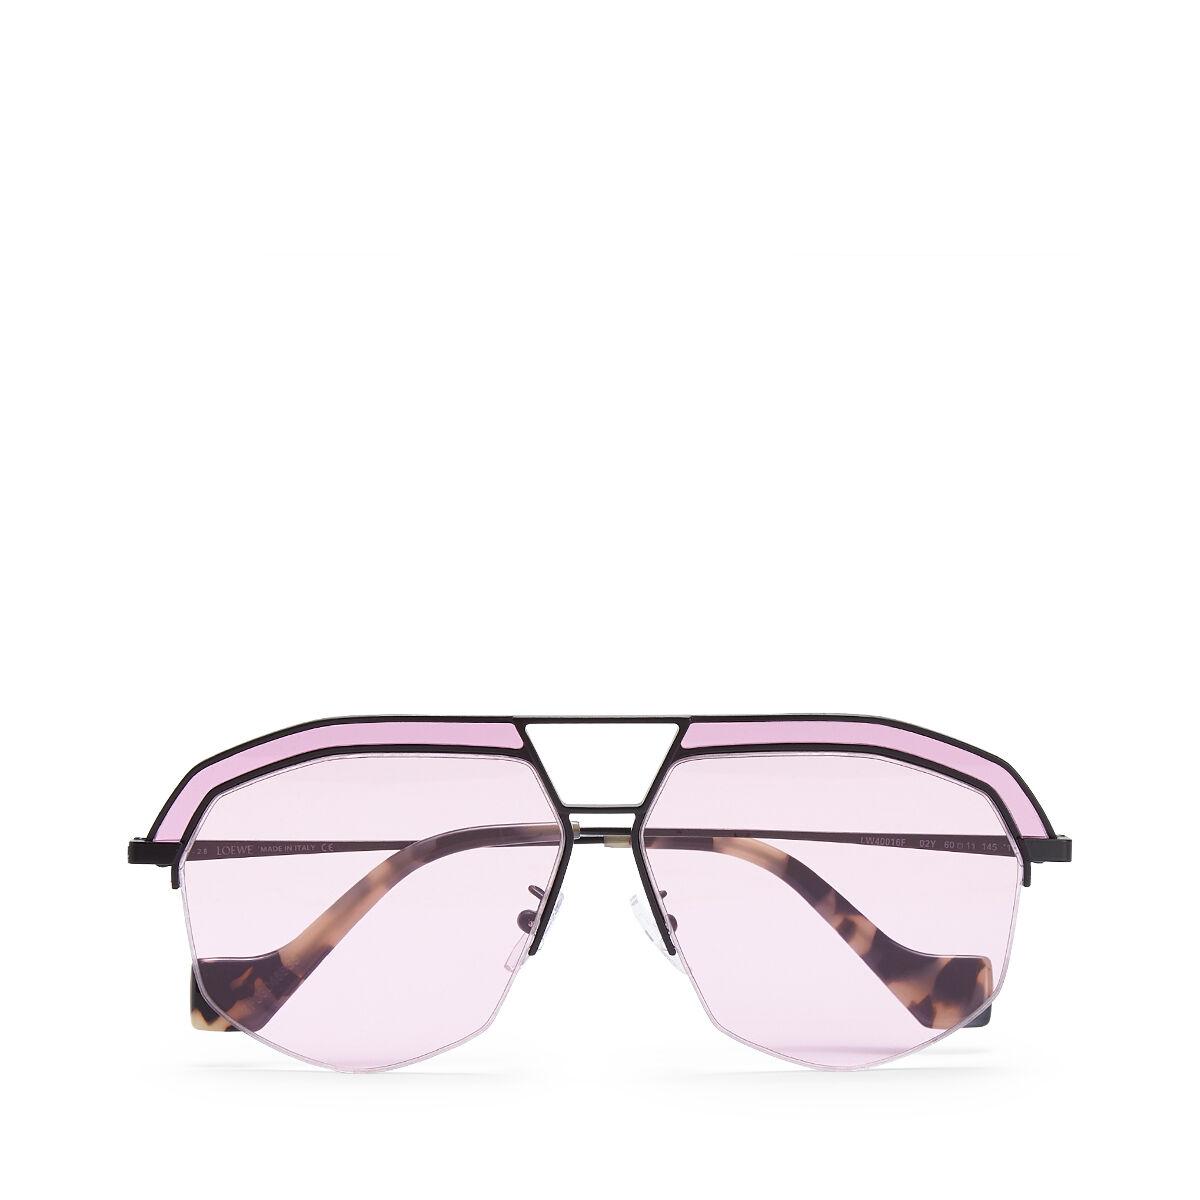 LOEWE Gafas Geometricas Negro Mate/Rosa front